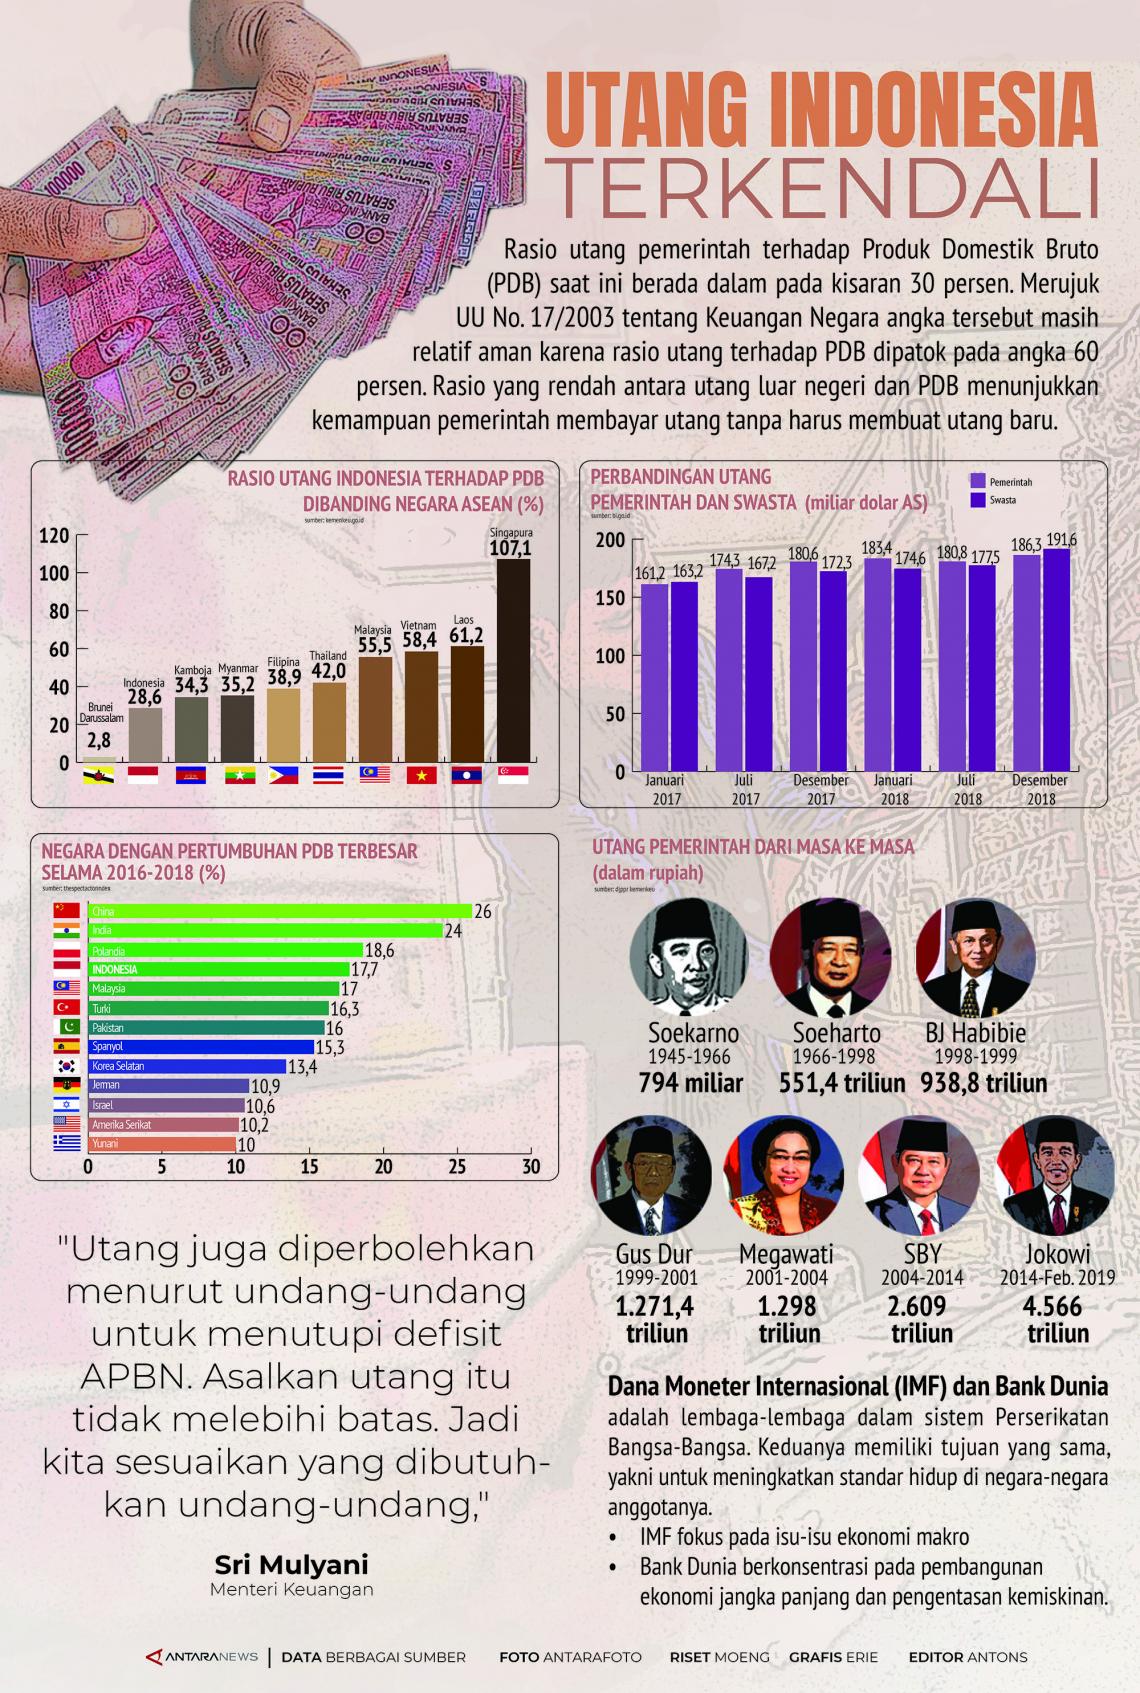 Utang Indonesia Terkendali